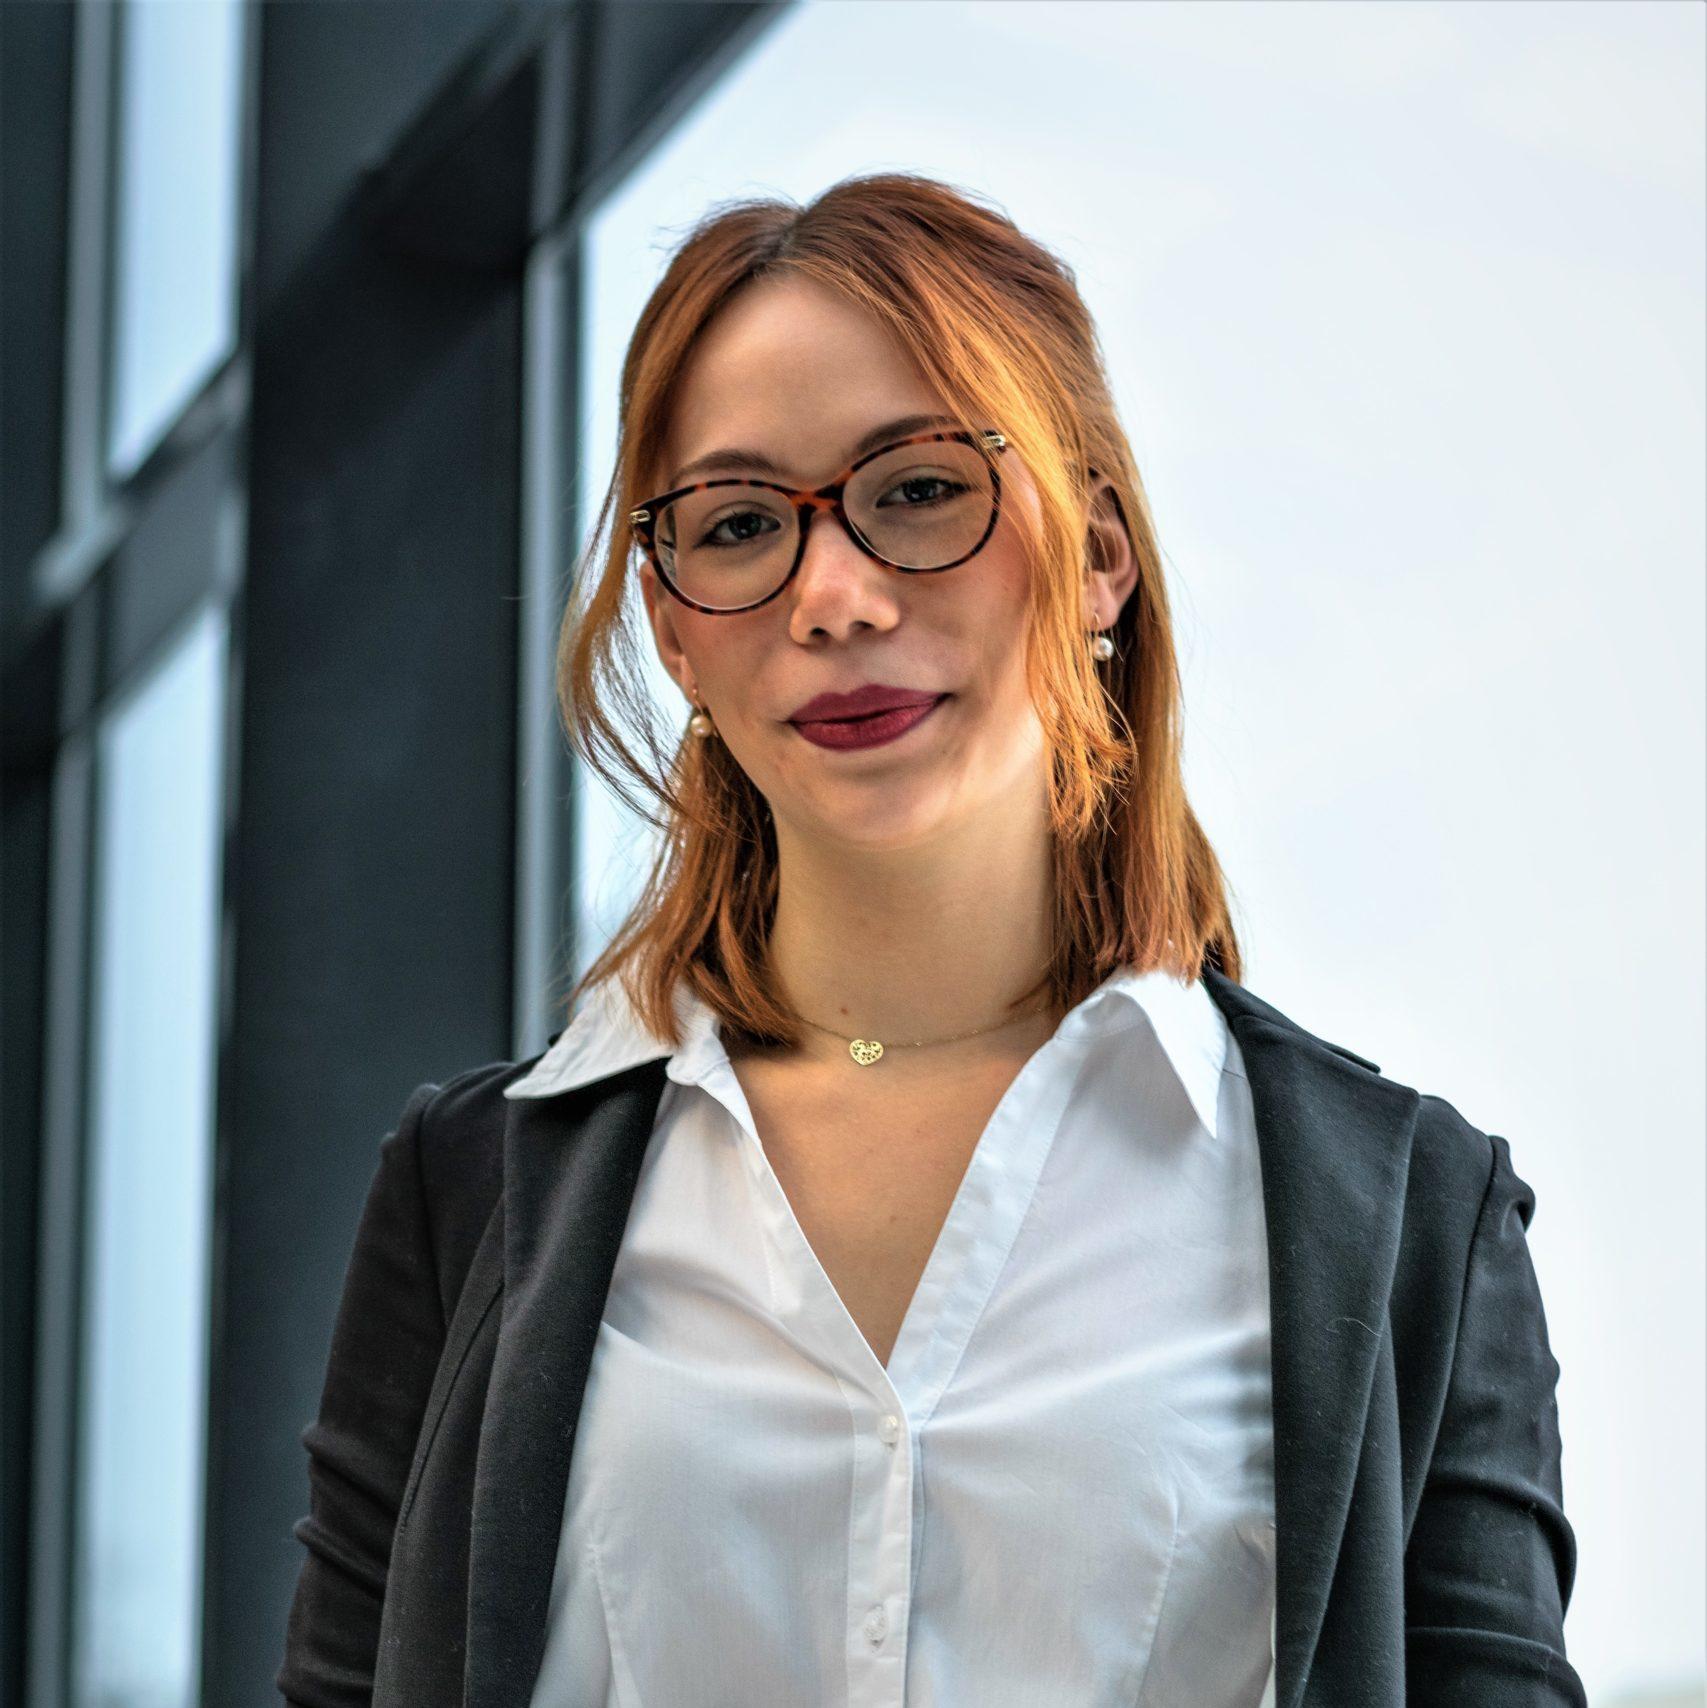 Dorota Kondratowicz